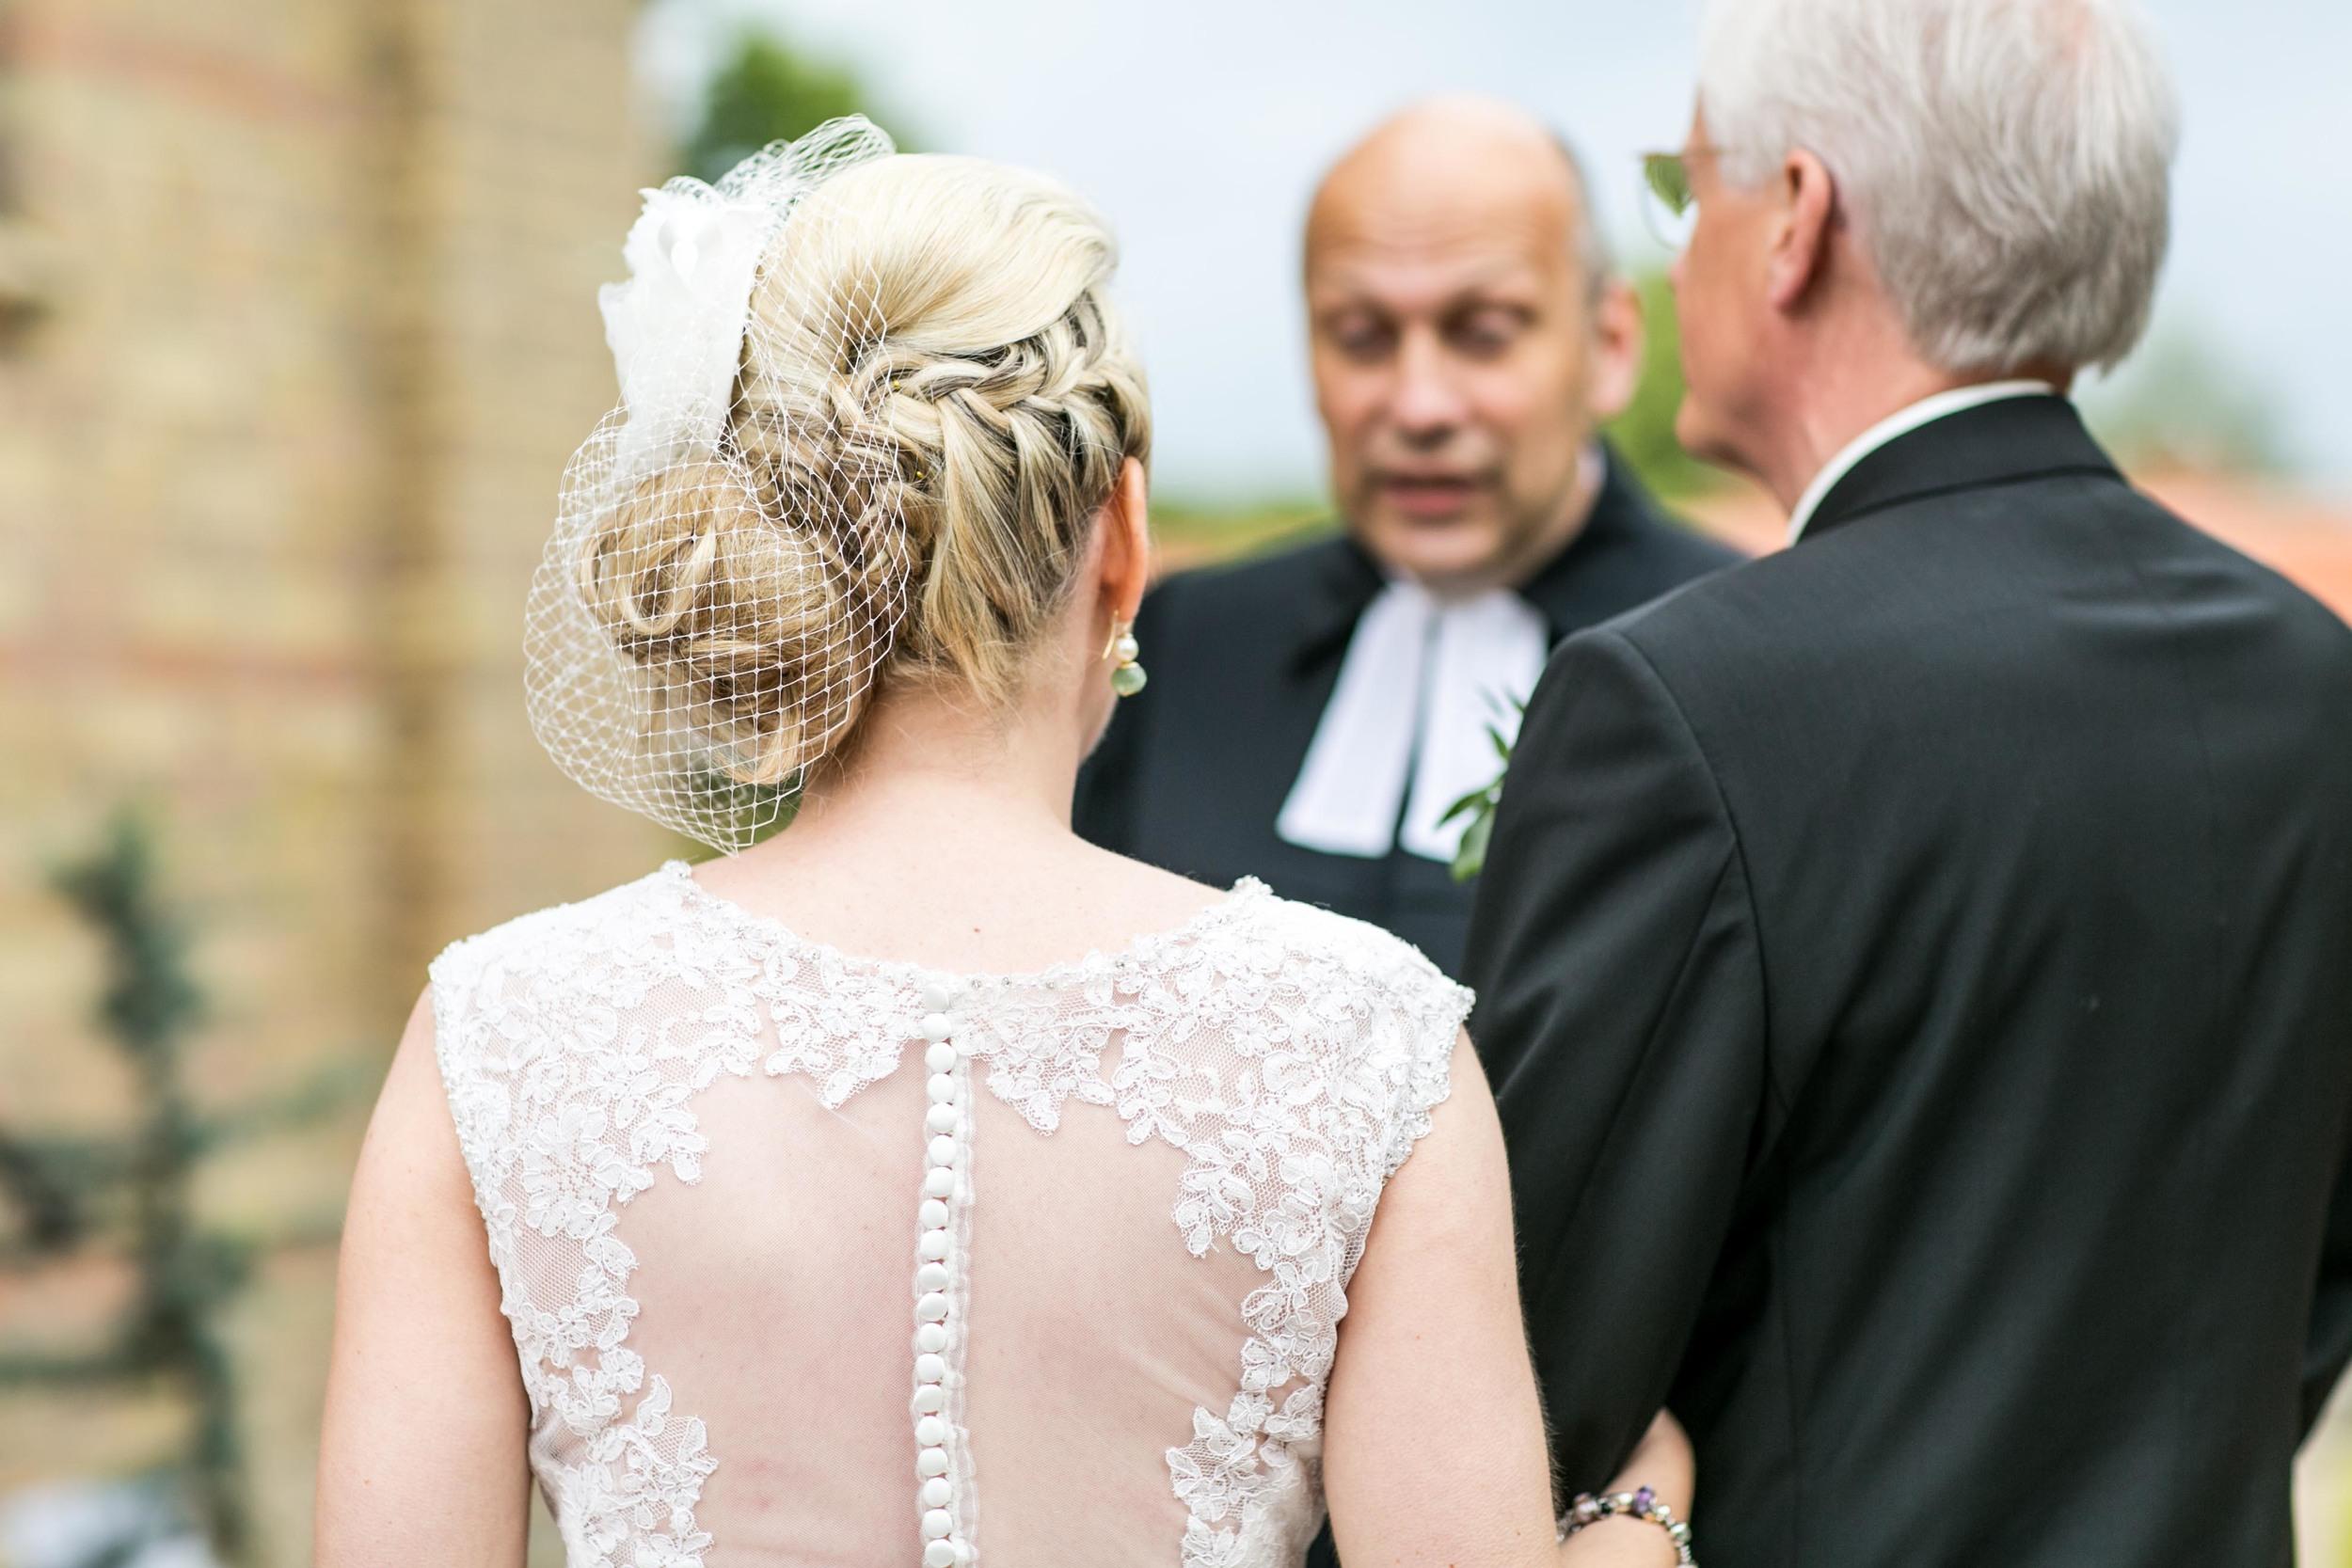 Hochzeitsfotografie Berlin_Fran Burrows Fotografie_9.jpg